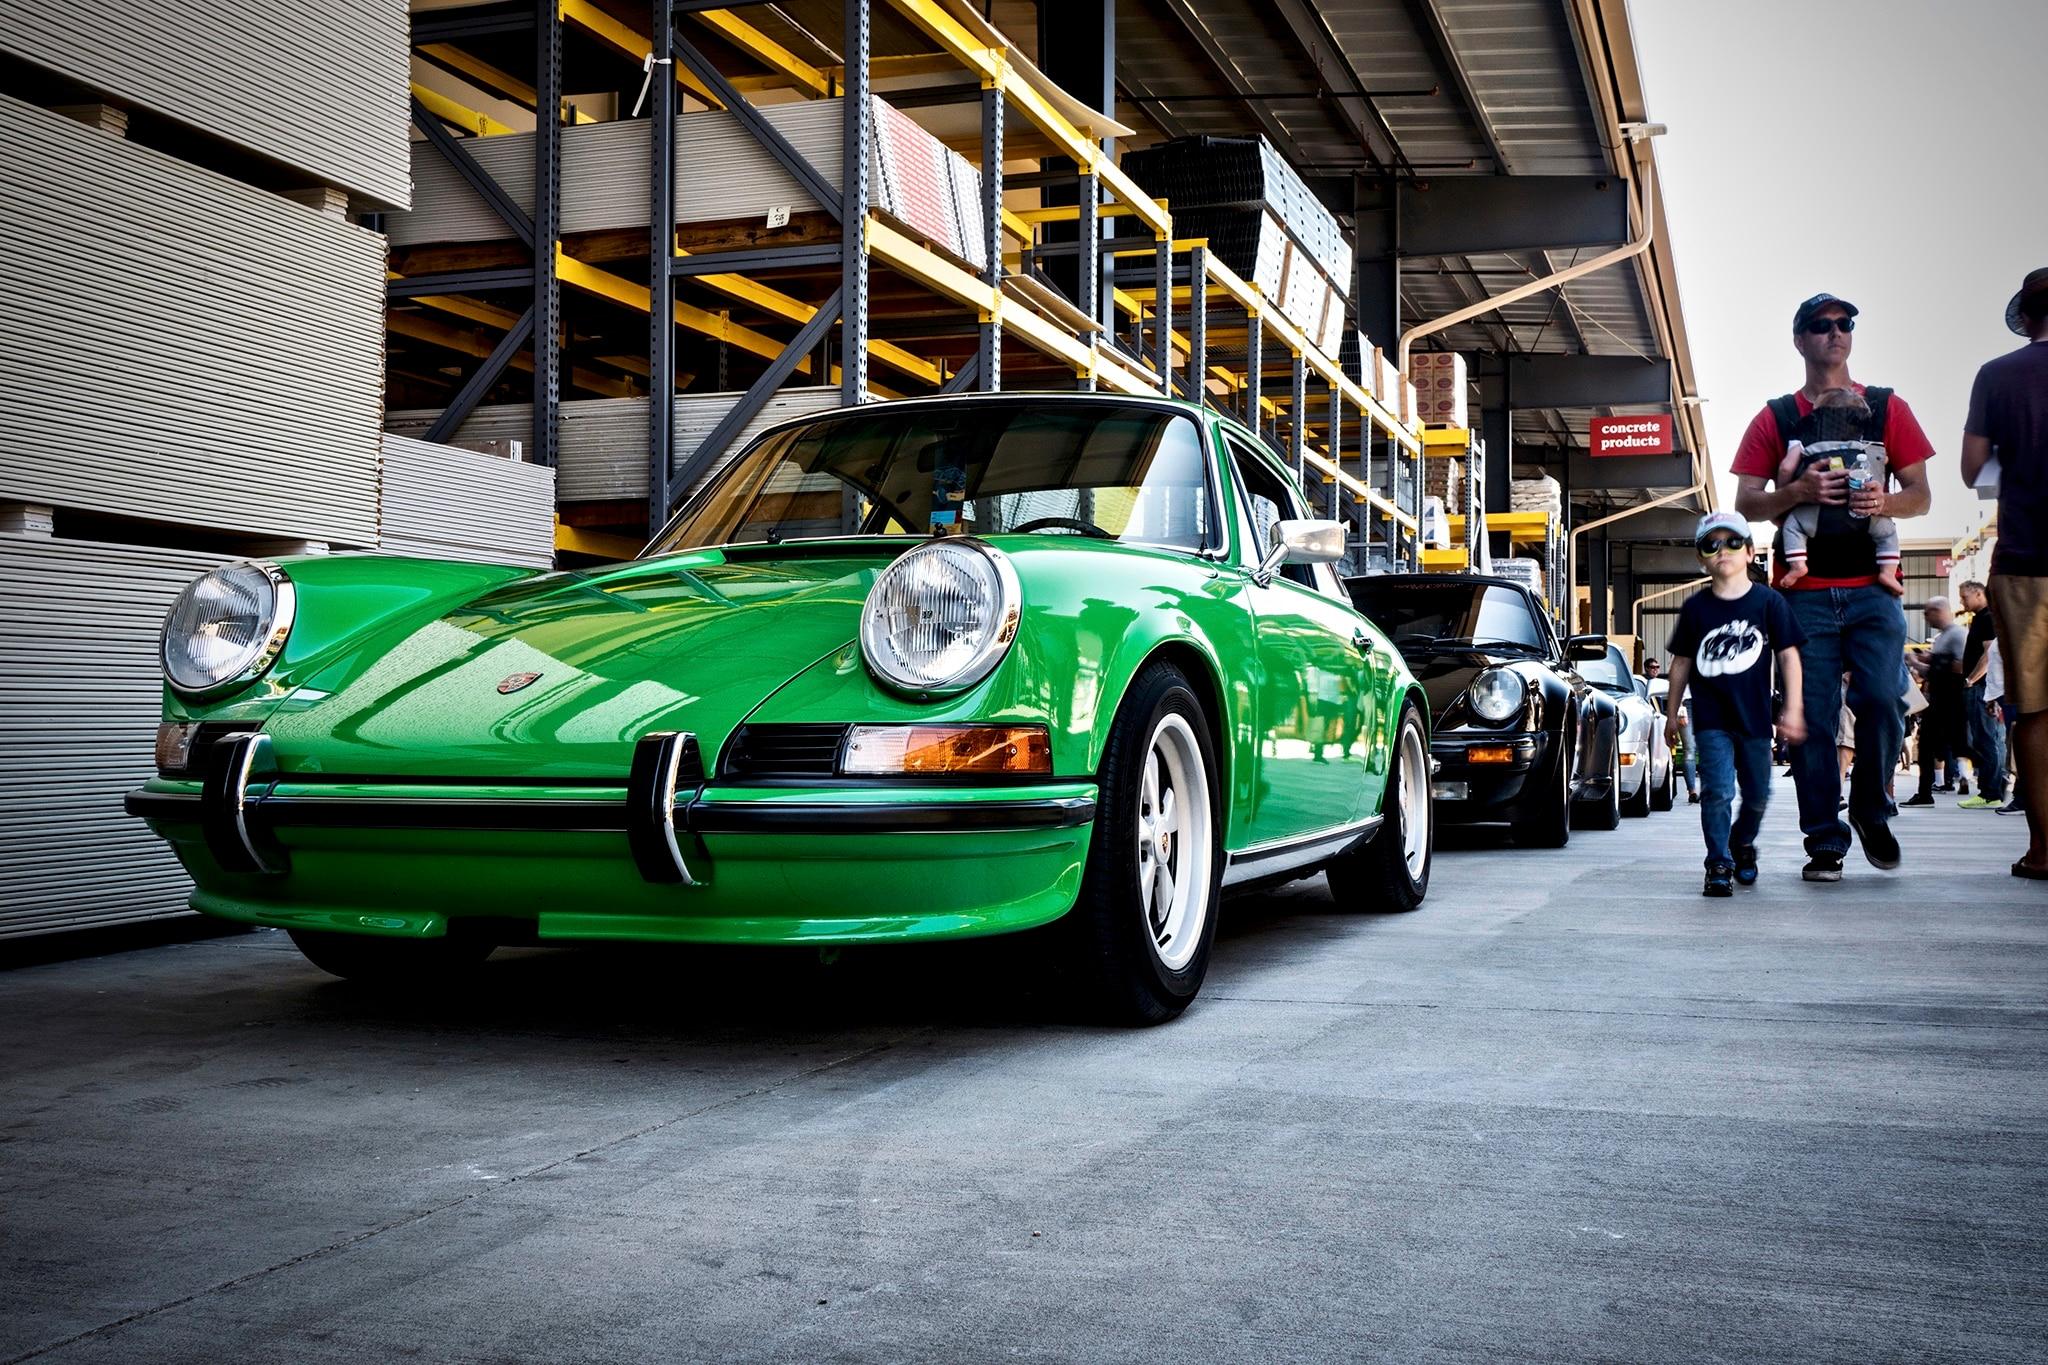 Porsche 911 Lineup 8 Luftgekuhlt 5